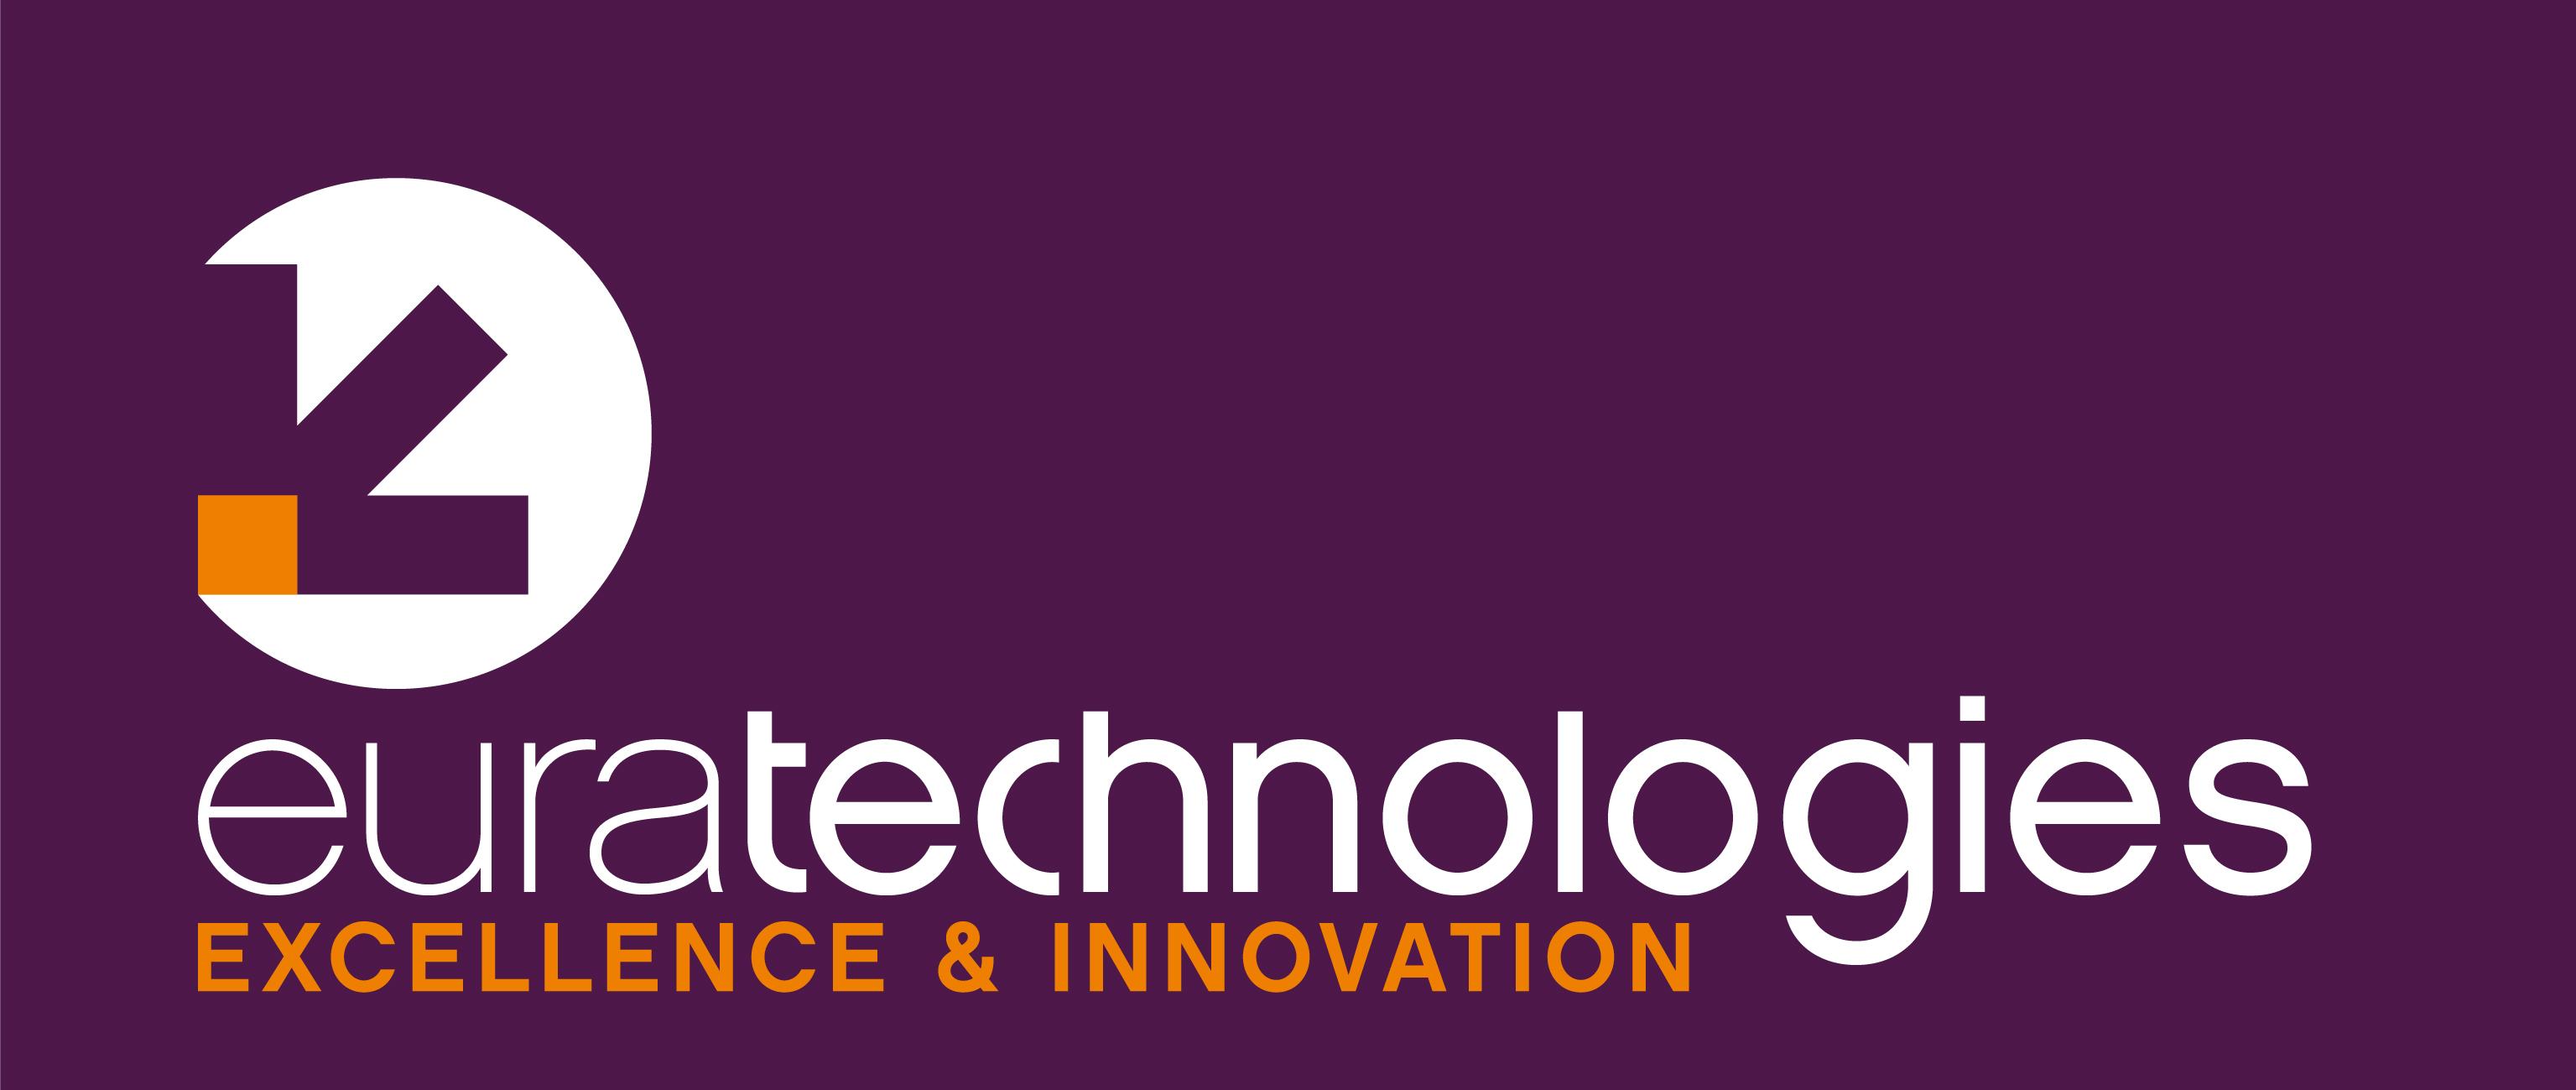 EURATECHNOLOGIES HD 1 - Euratechnologies